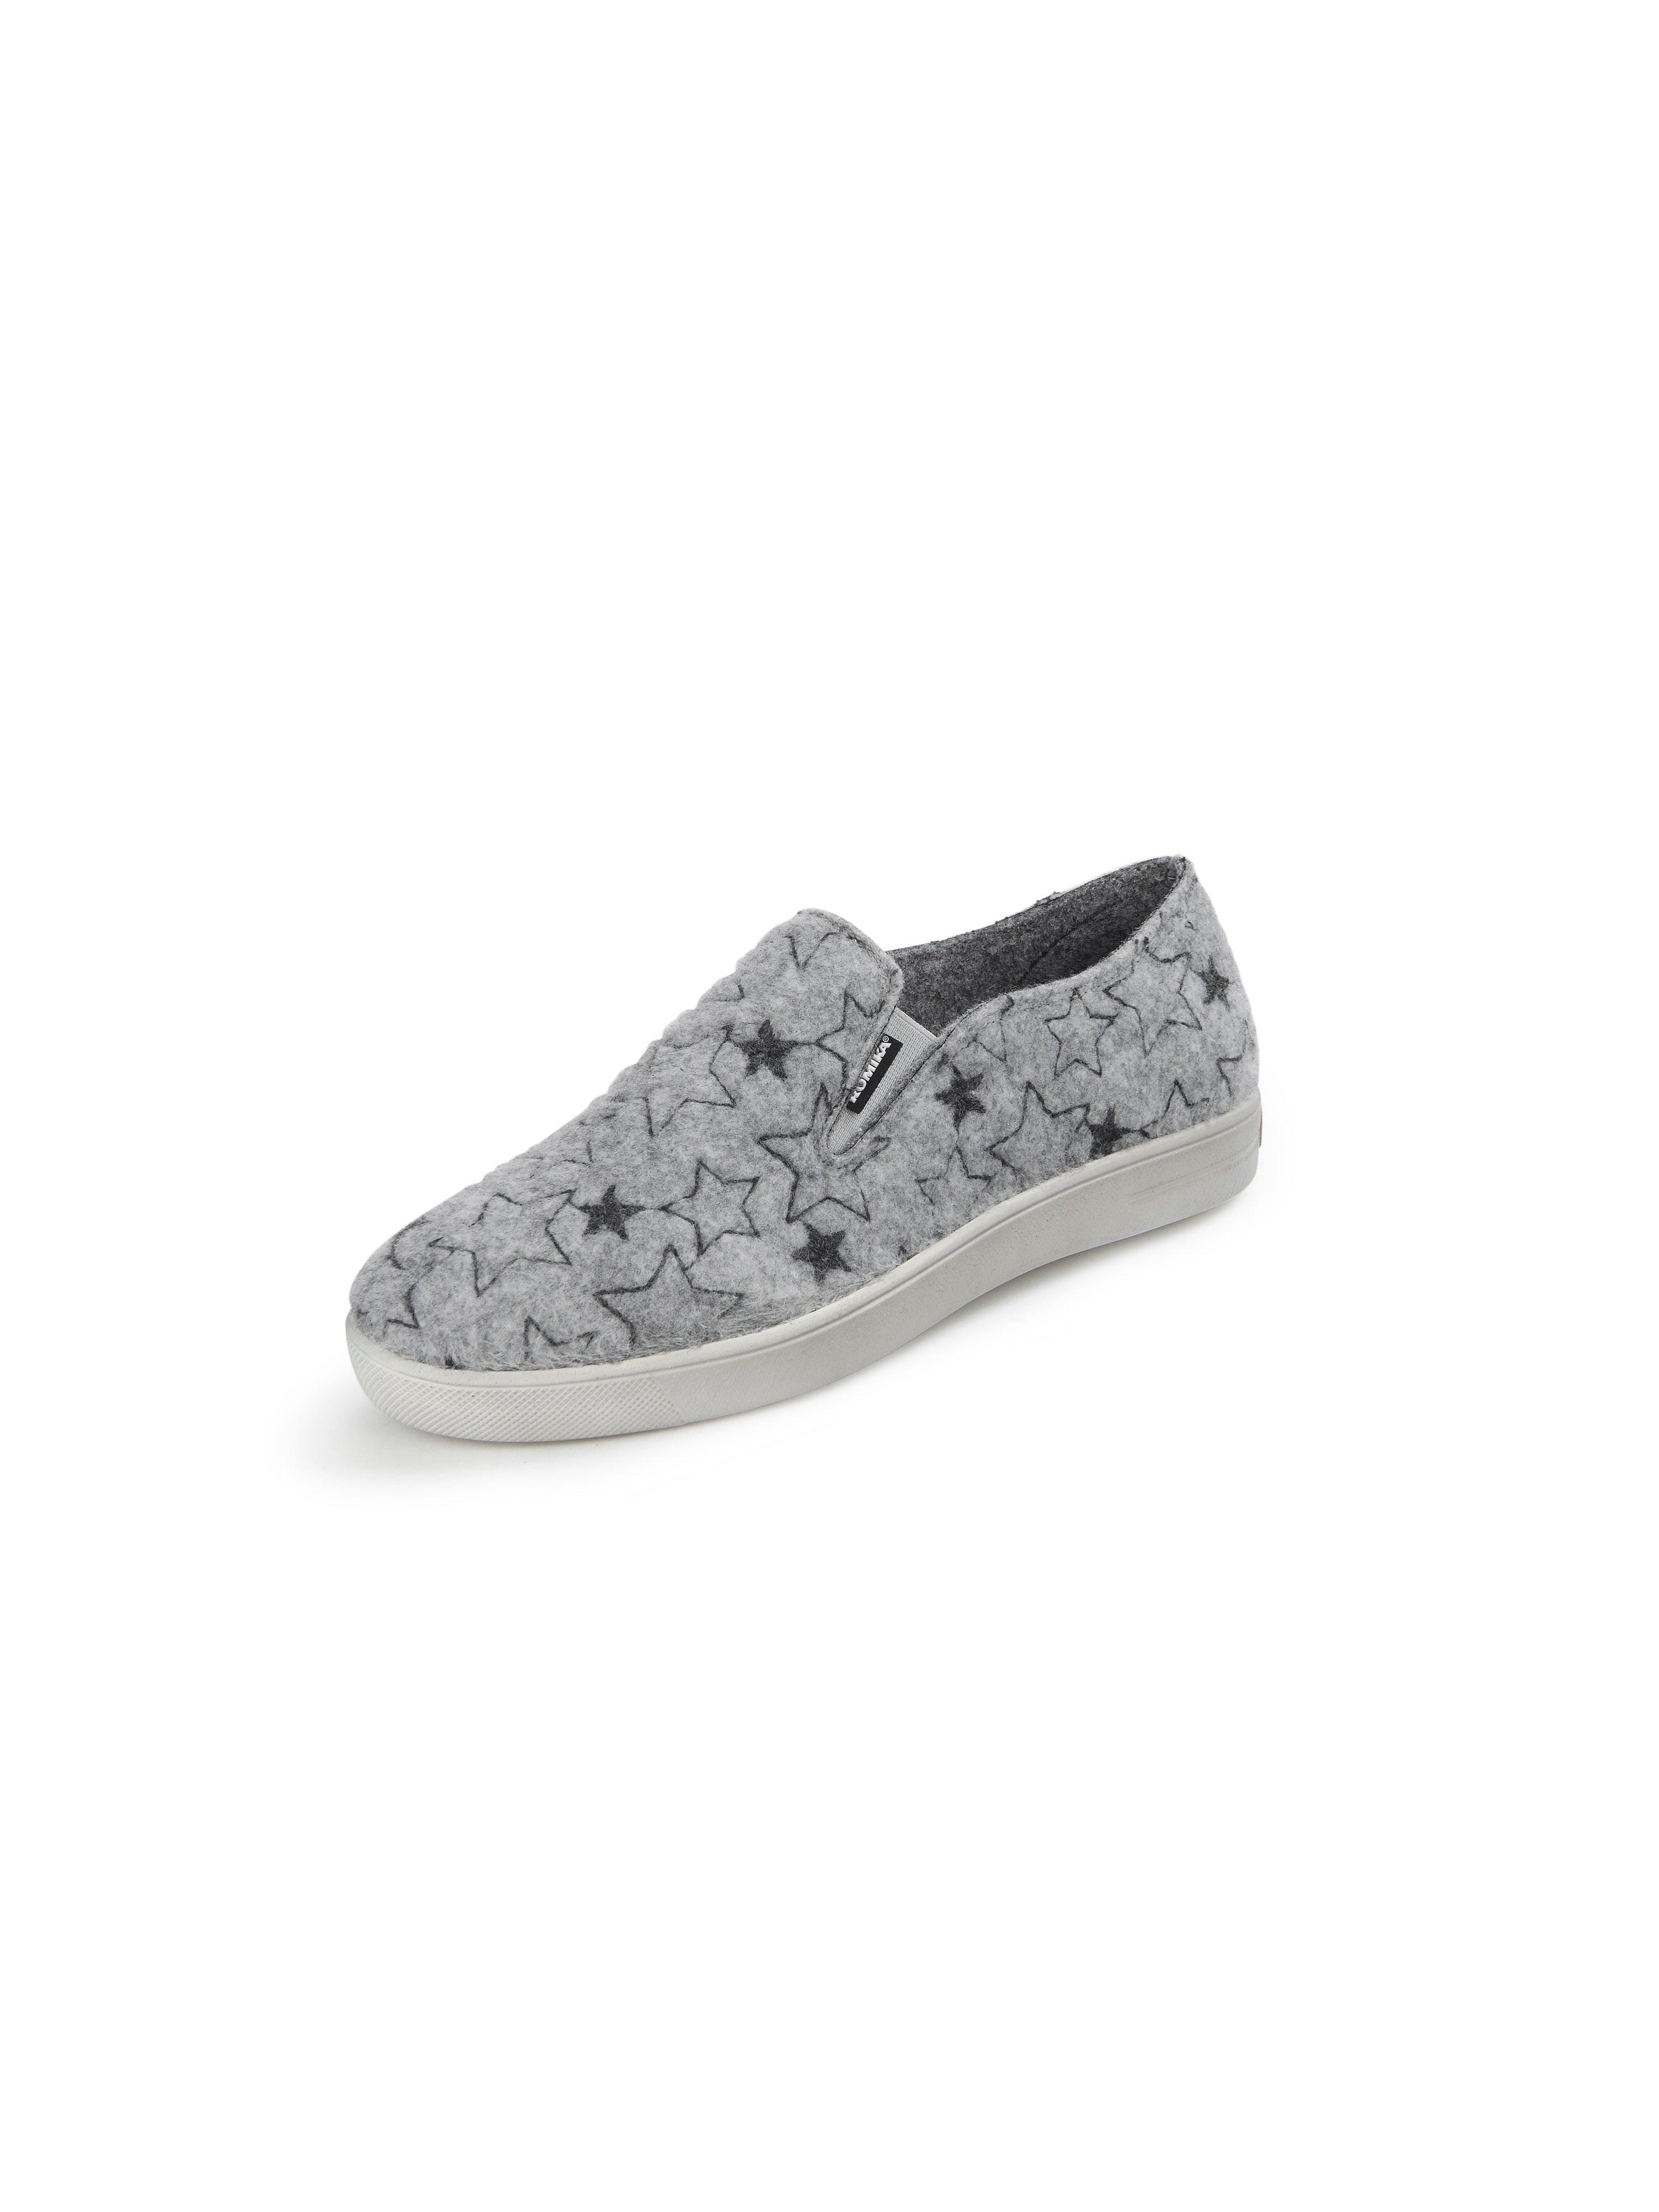 Pantoffels Van Romika grijs